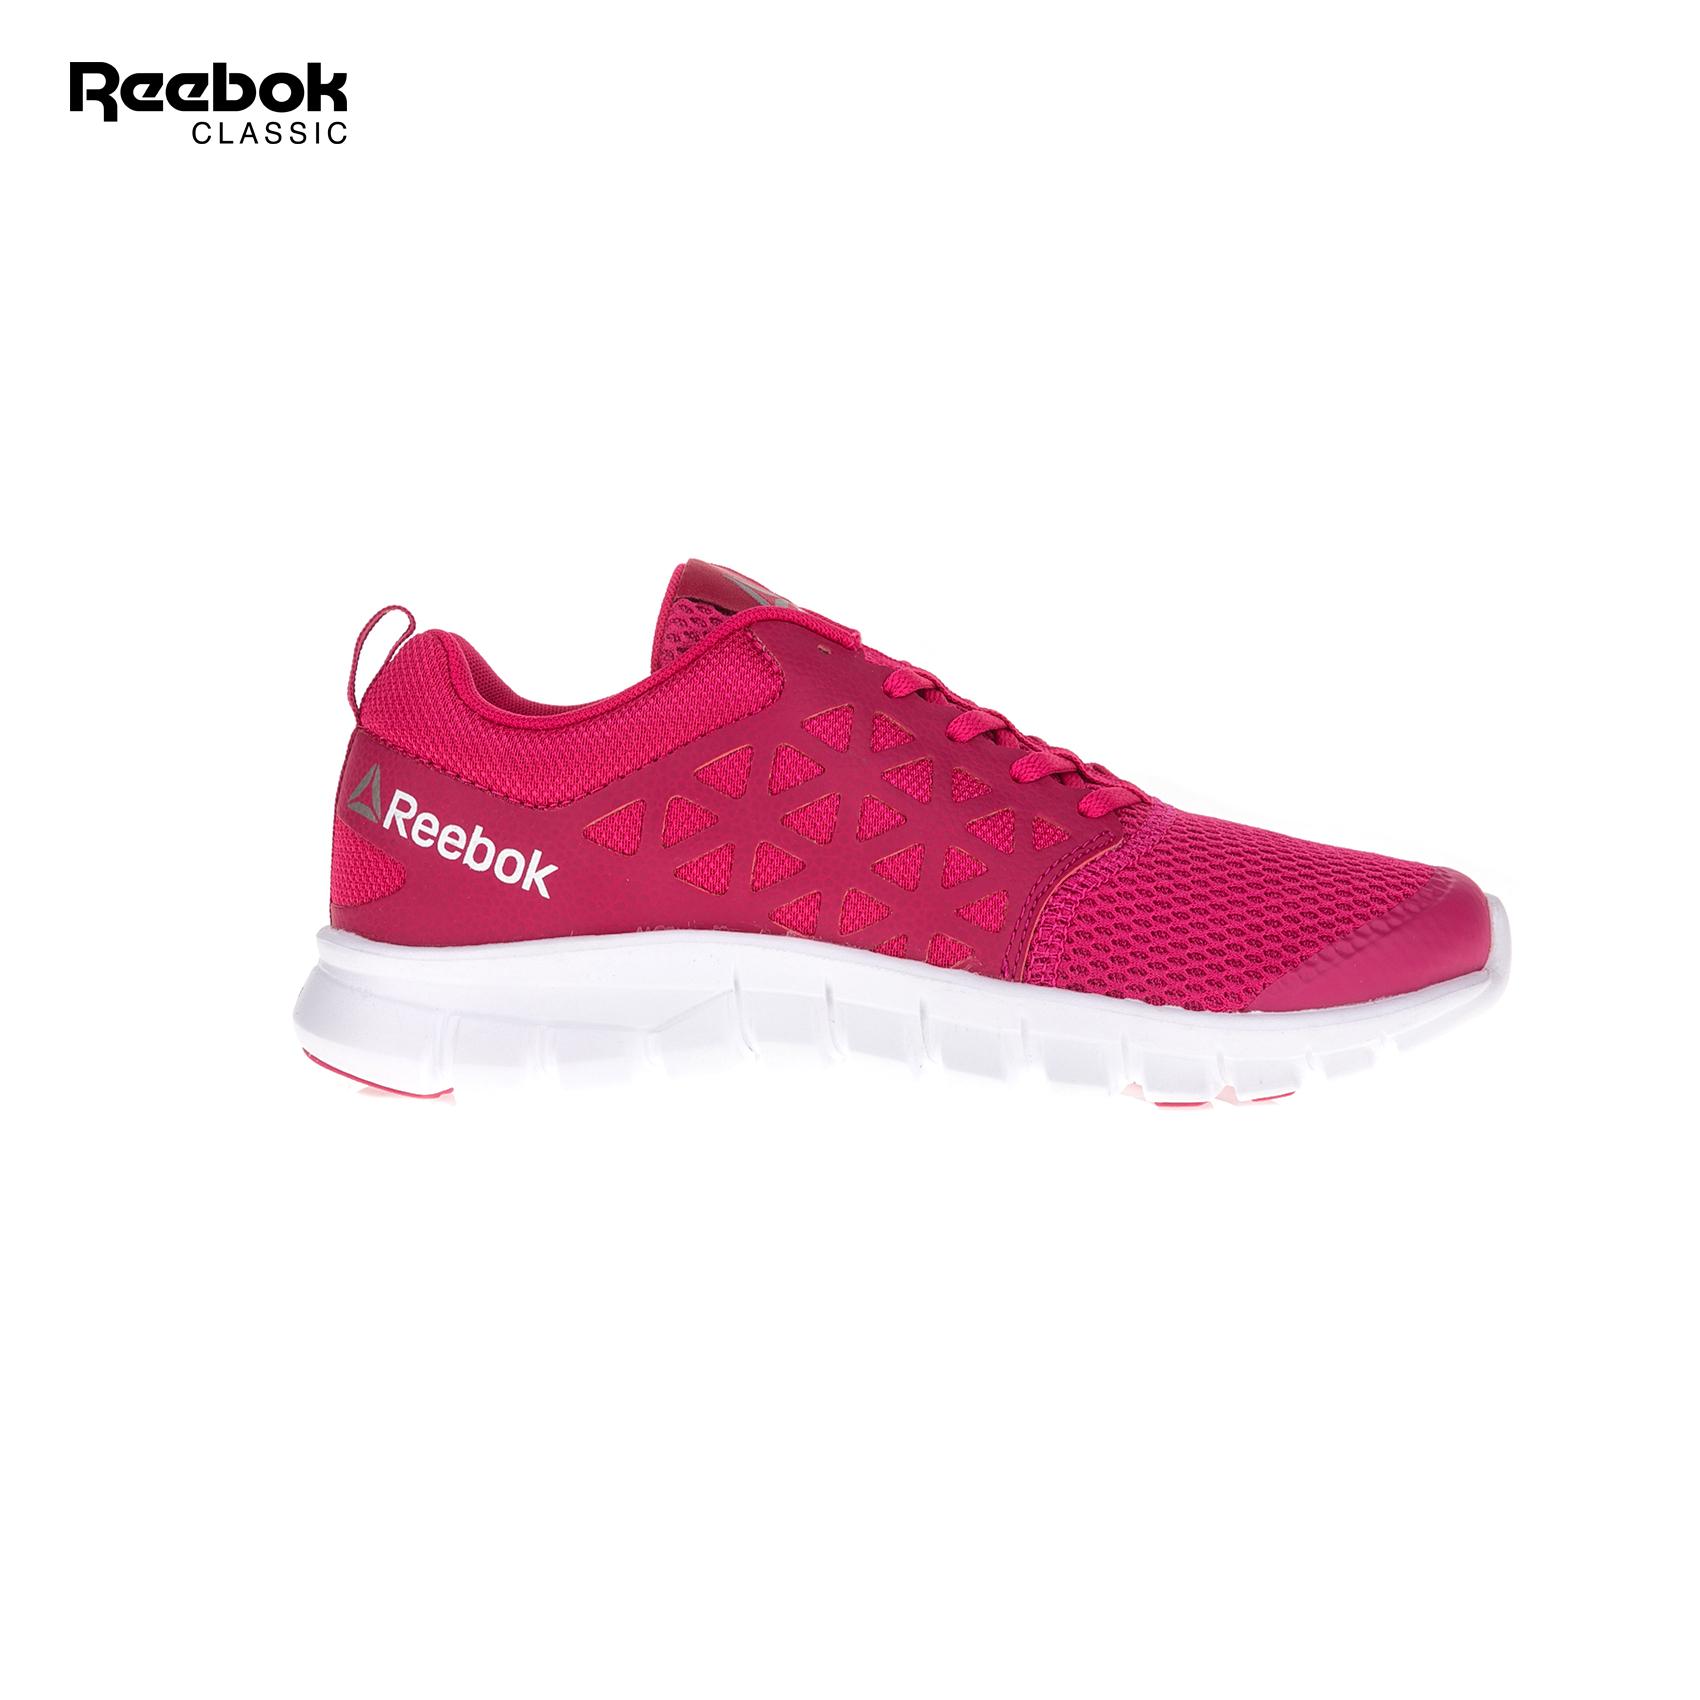 REEBOK CLASSIC – Γυναικεία παπούτσια για τρέξιμο REEBOK SUBLITE XT CUSHION 2.0 MT ροζ